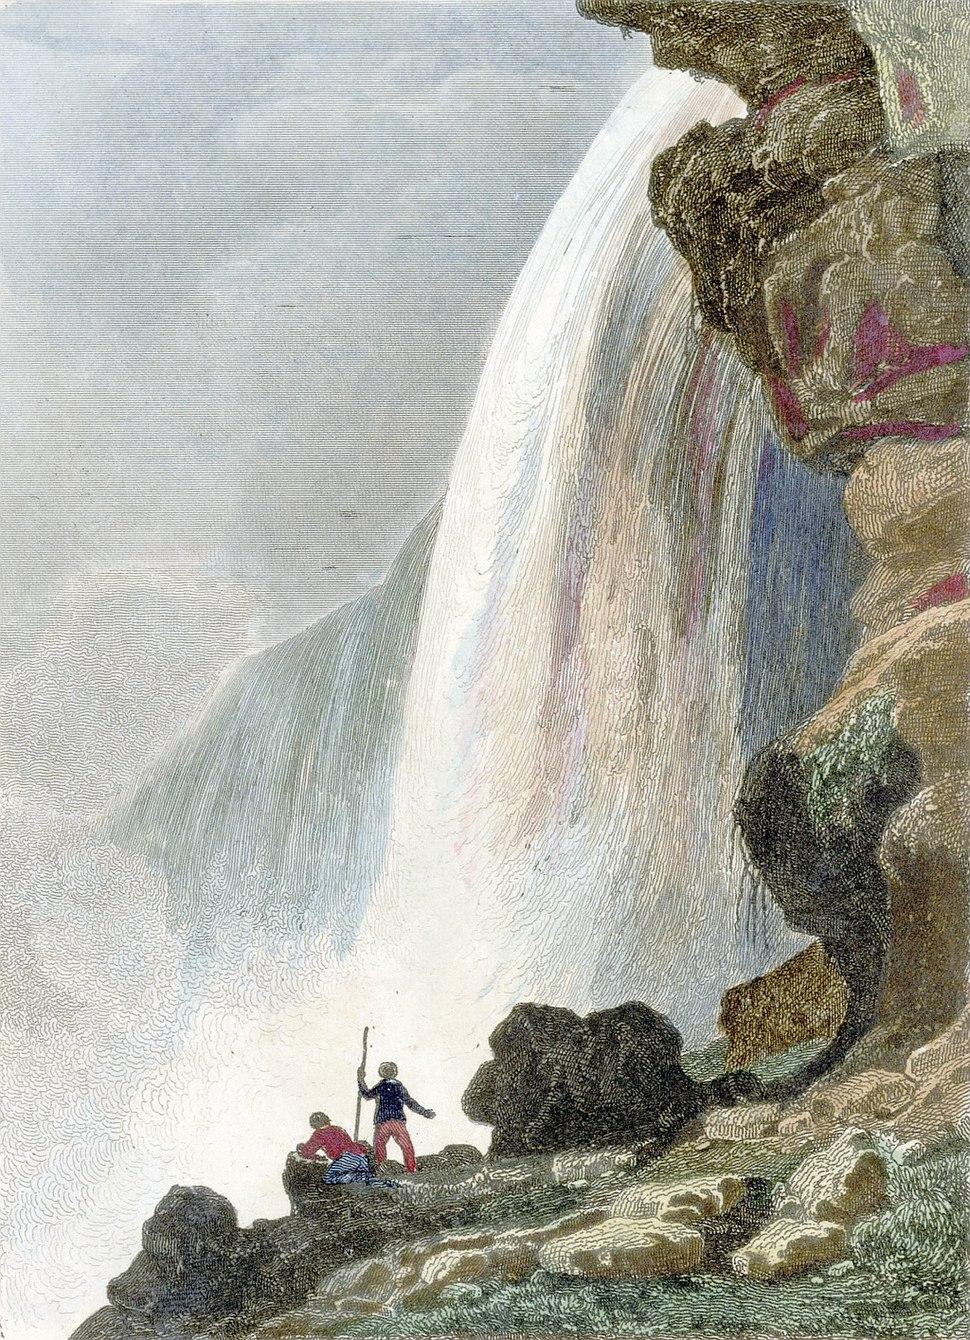 """Voute sous la Chute du Niagara - Niagara Falls"" by Jacques-Hippolyte van der Burch"